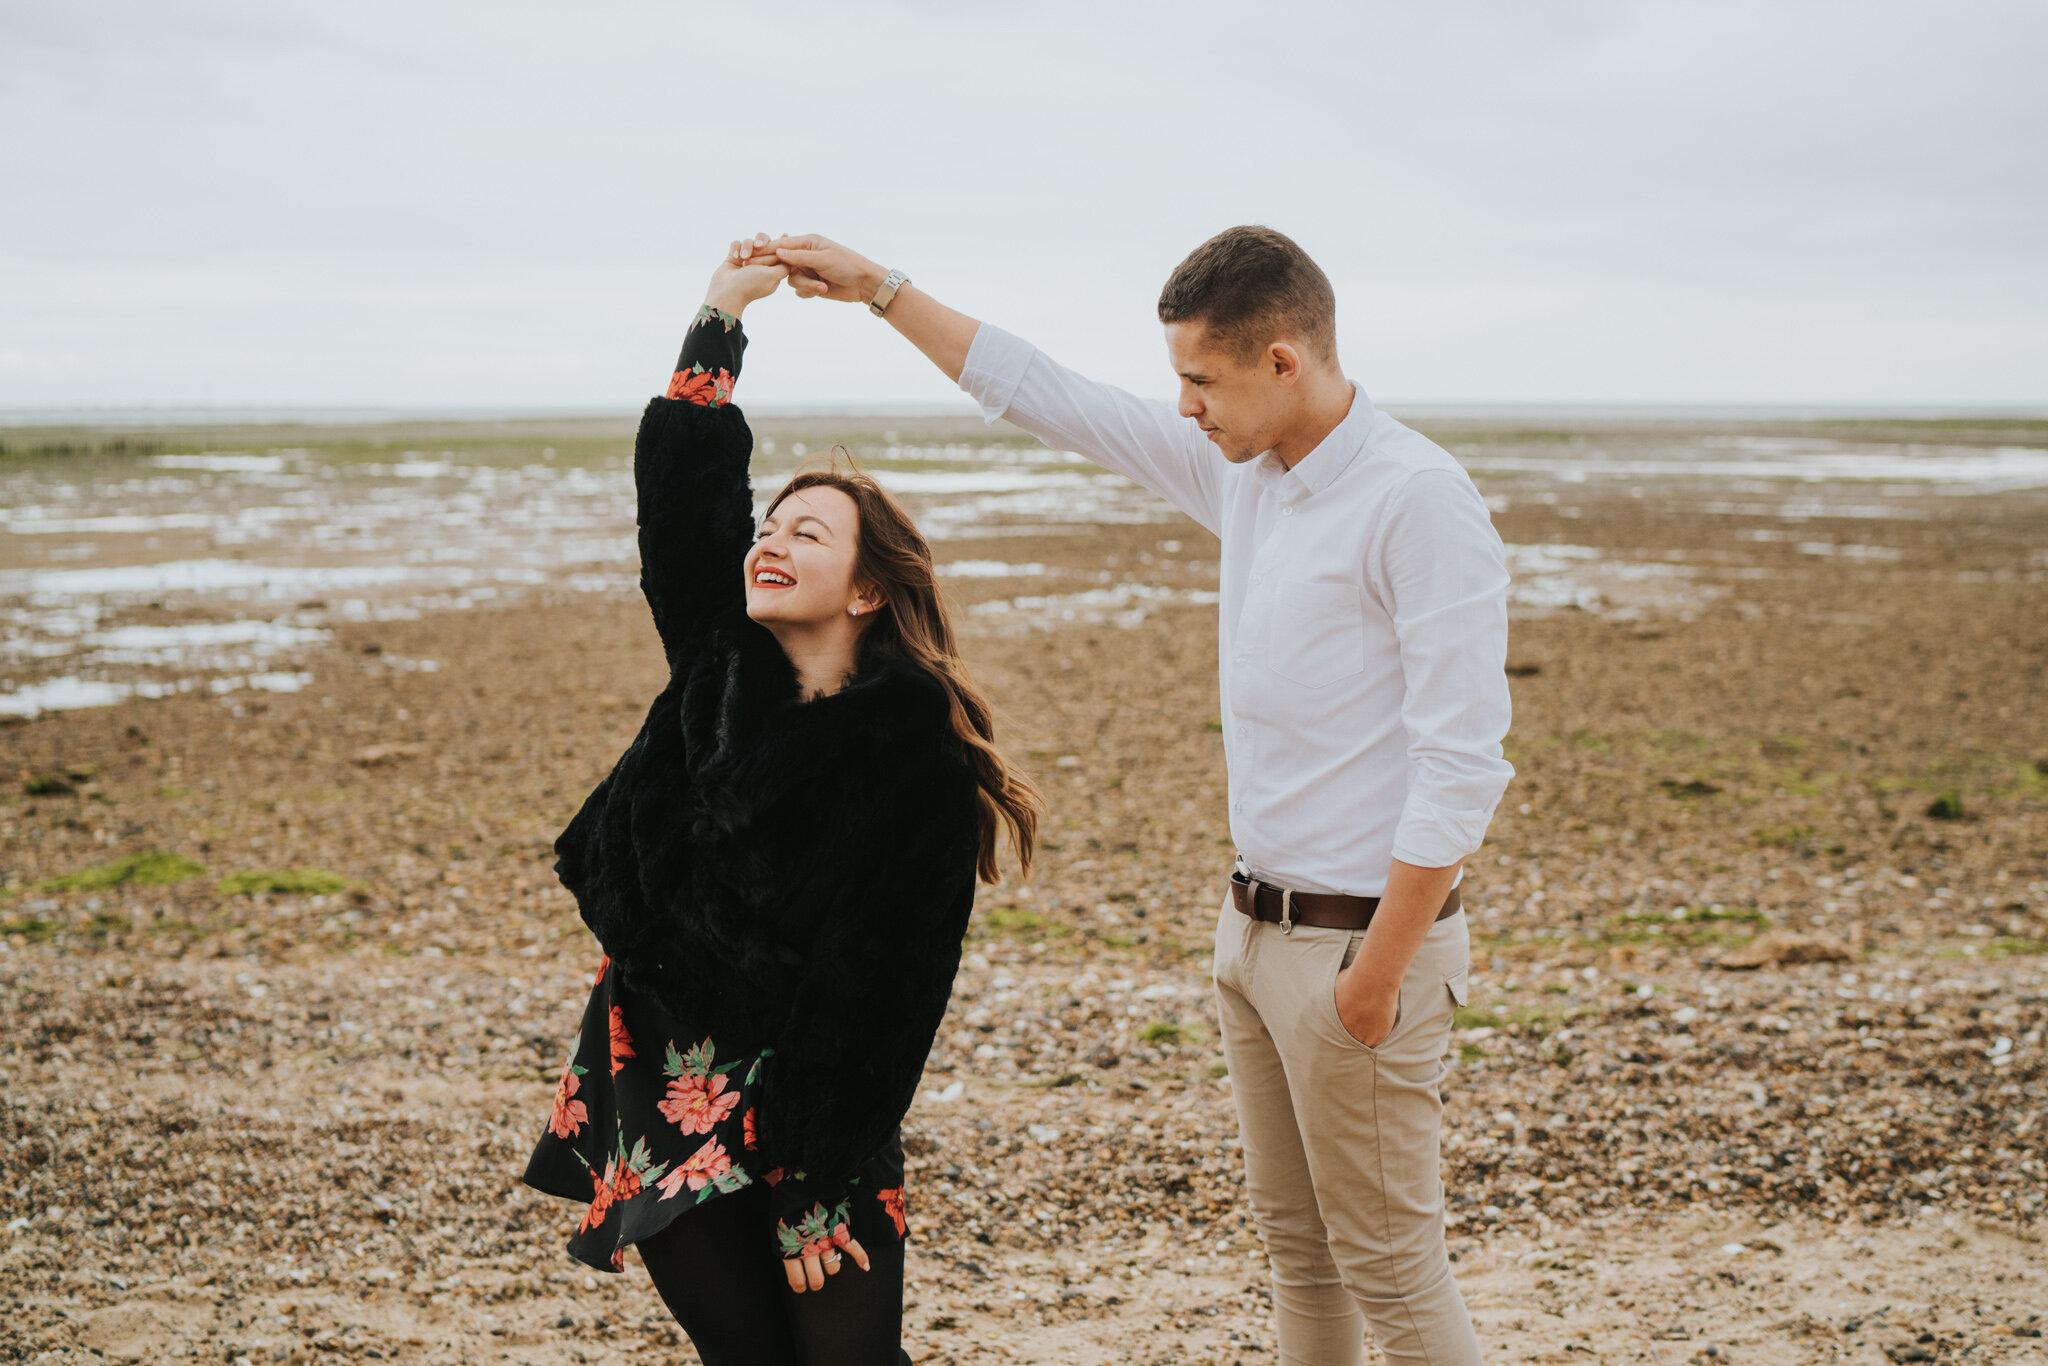 engagement-pre-wedding-hannah-michael-cudmore-grove-east-mersea-grace-elizabeth-colchester-essex-devon-suffolk-and-norfolk-alternative-wedding-and-family-photographer (39 of 51).jpg